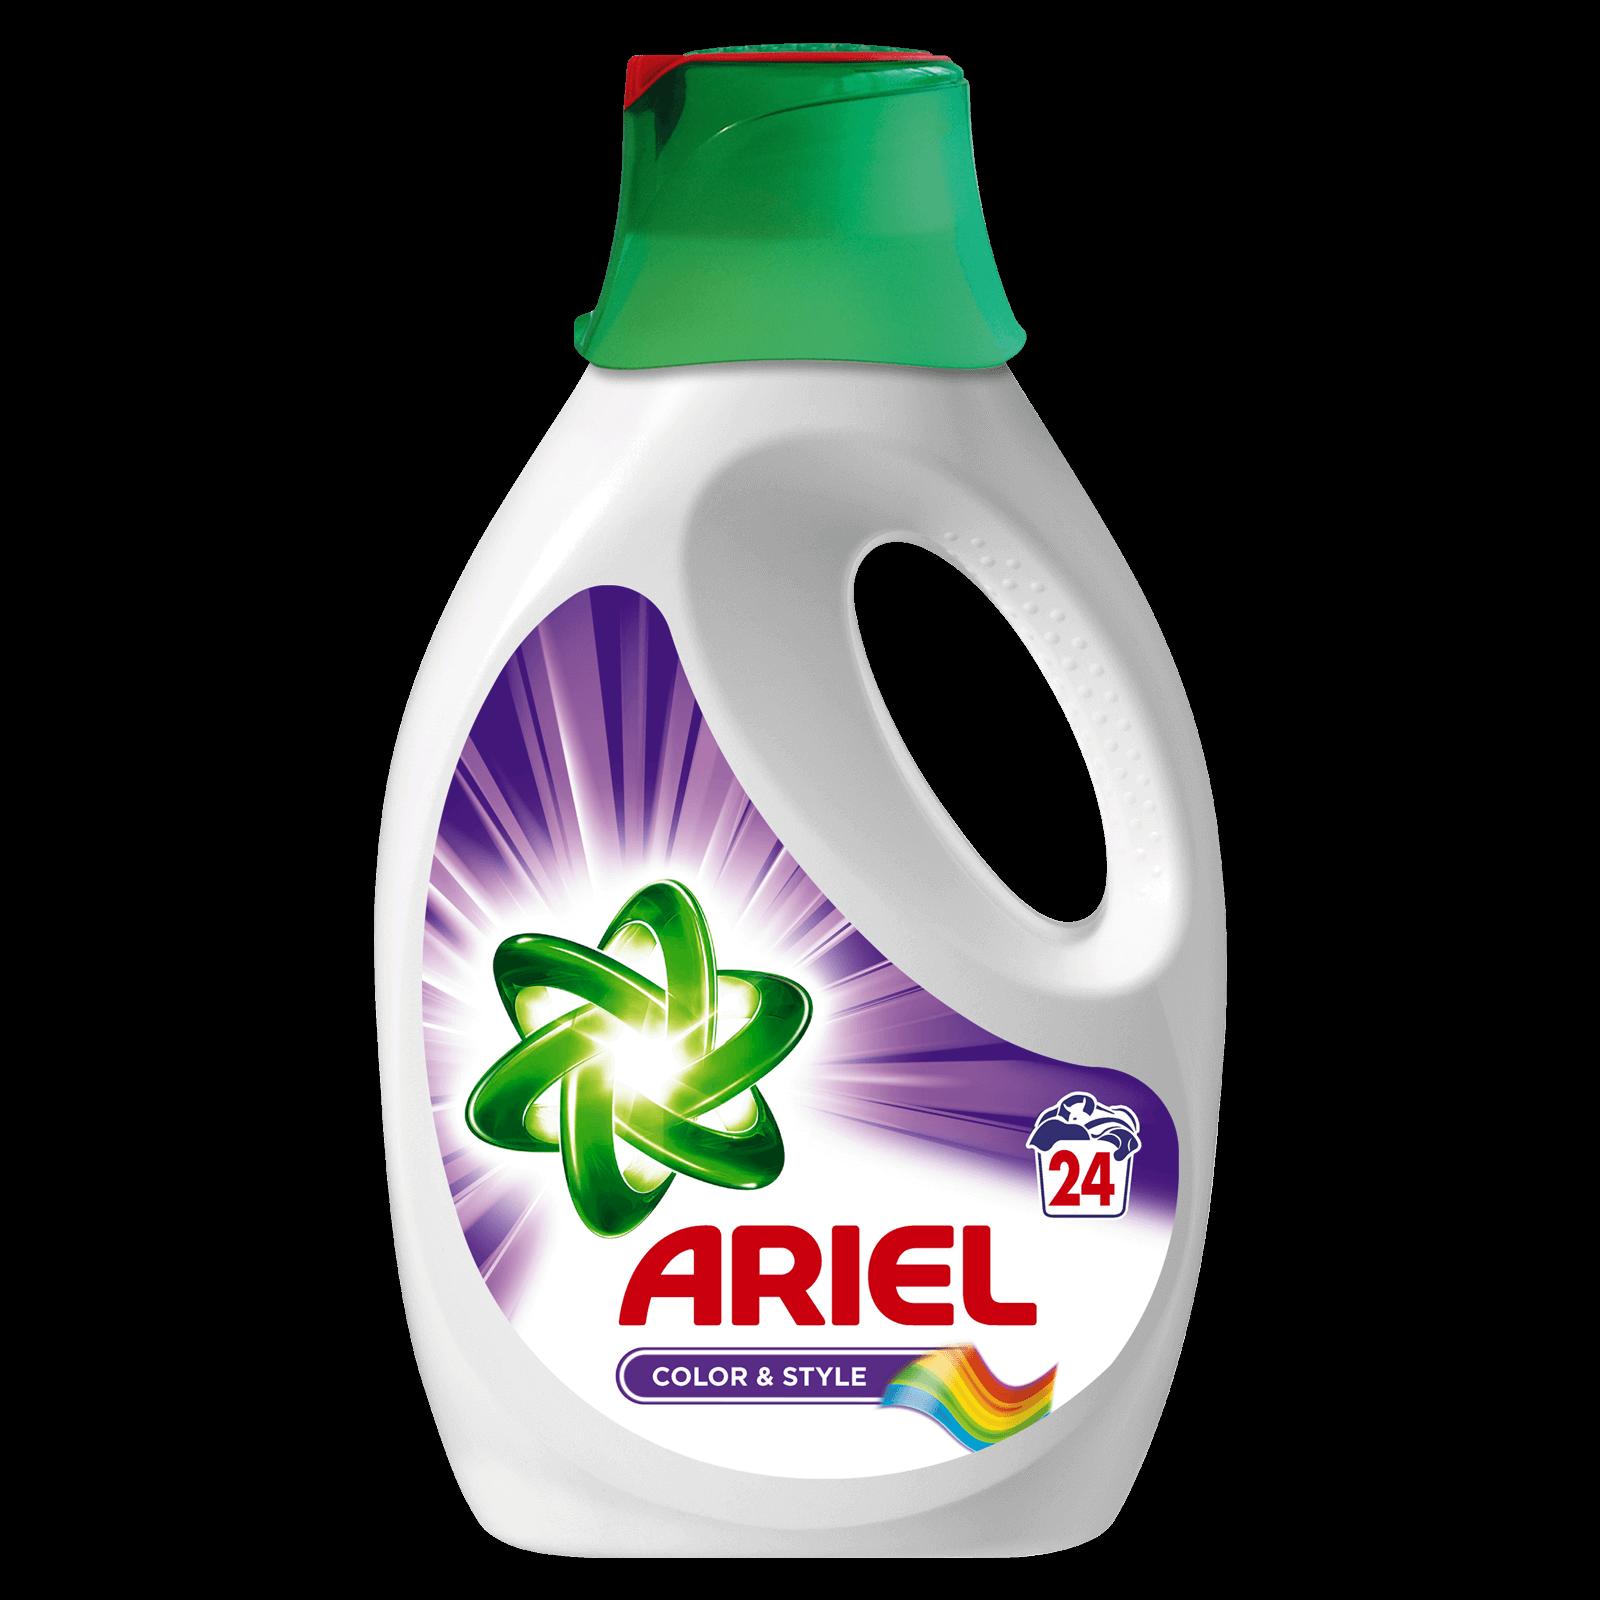 ariel colour liquid � onyx corporation